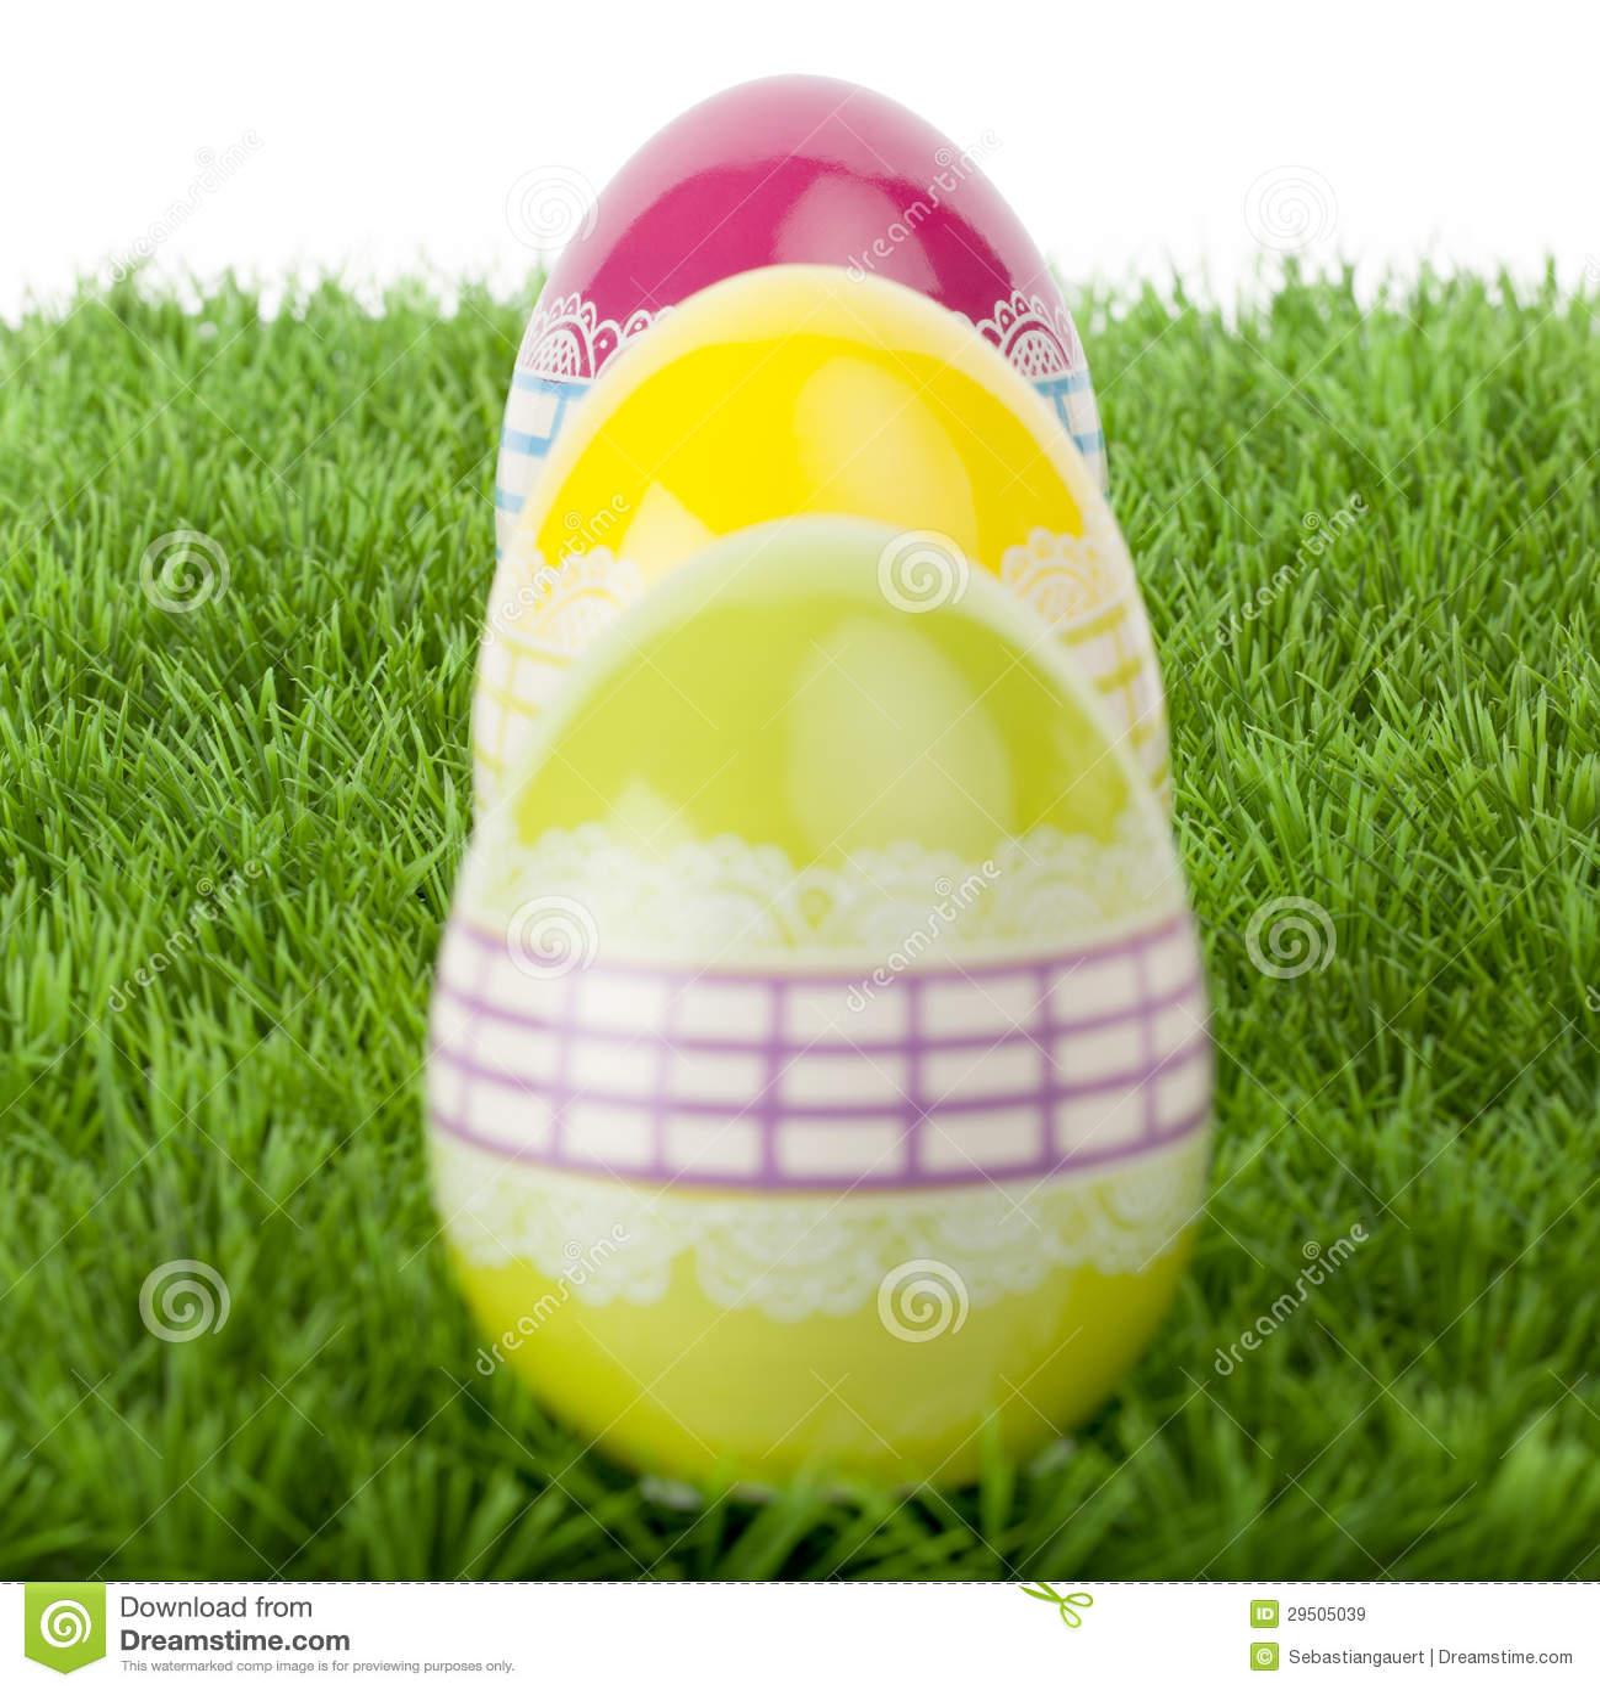 Colourful vibrant Easter eggs